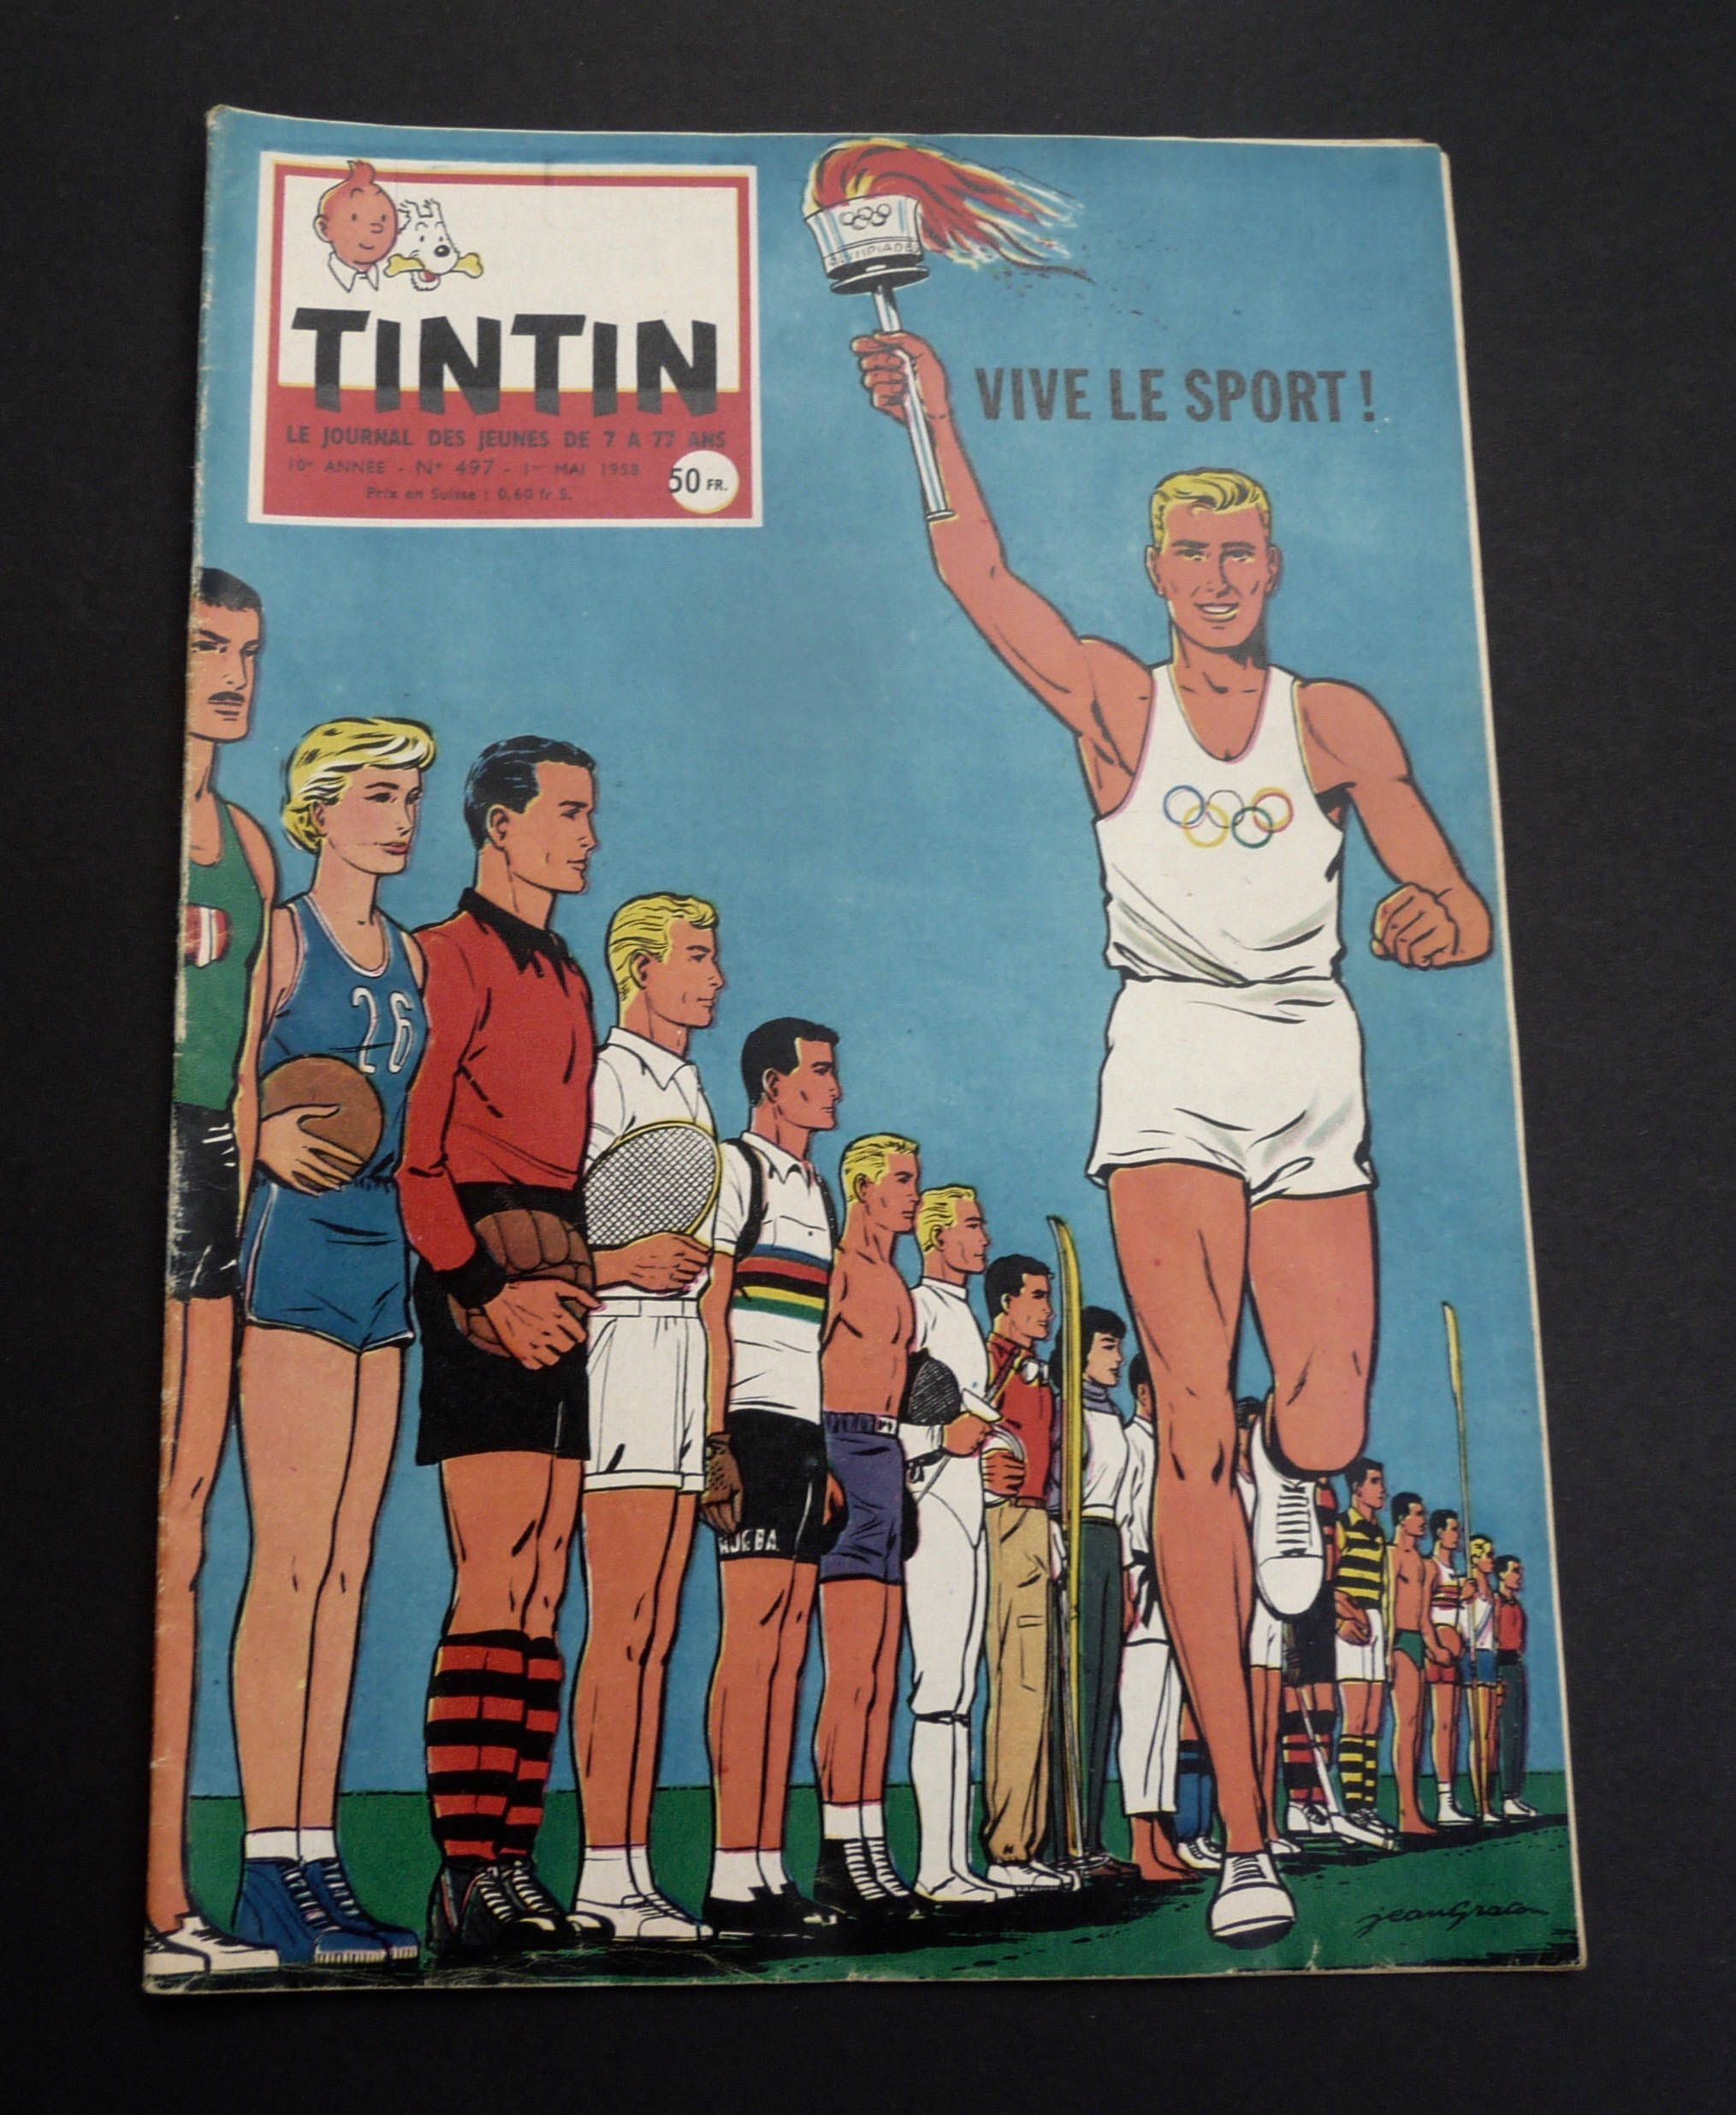 Journal Tintin 1 Mai 1958 10e Annee N 497 Edition Etsy Tintin Comic Books Comic Book Cover